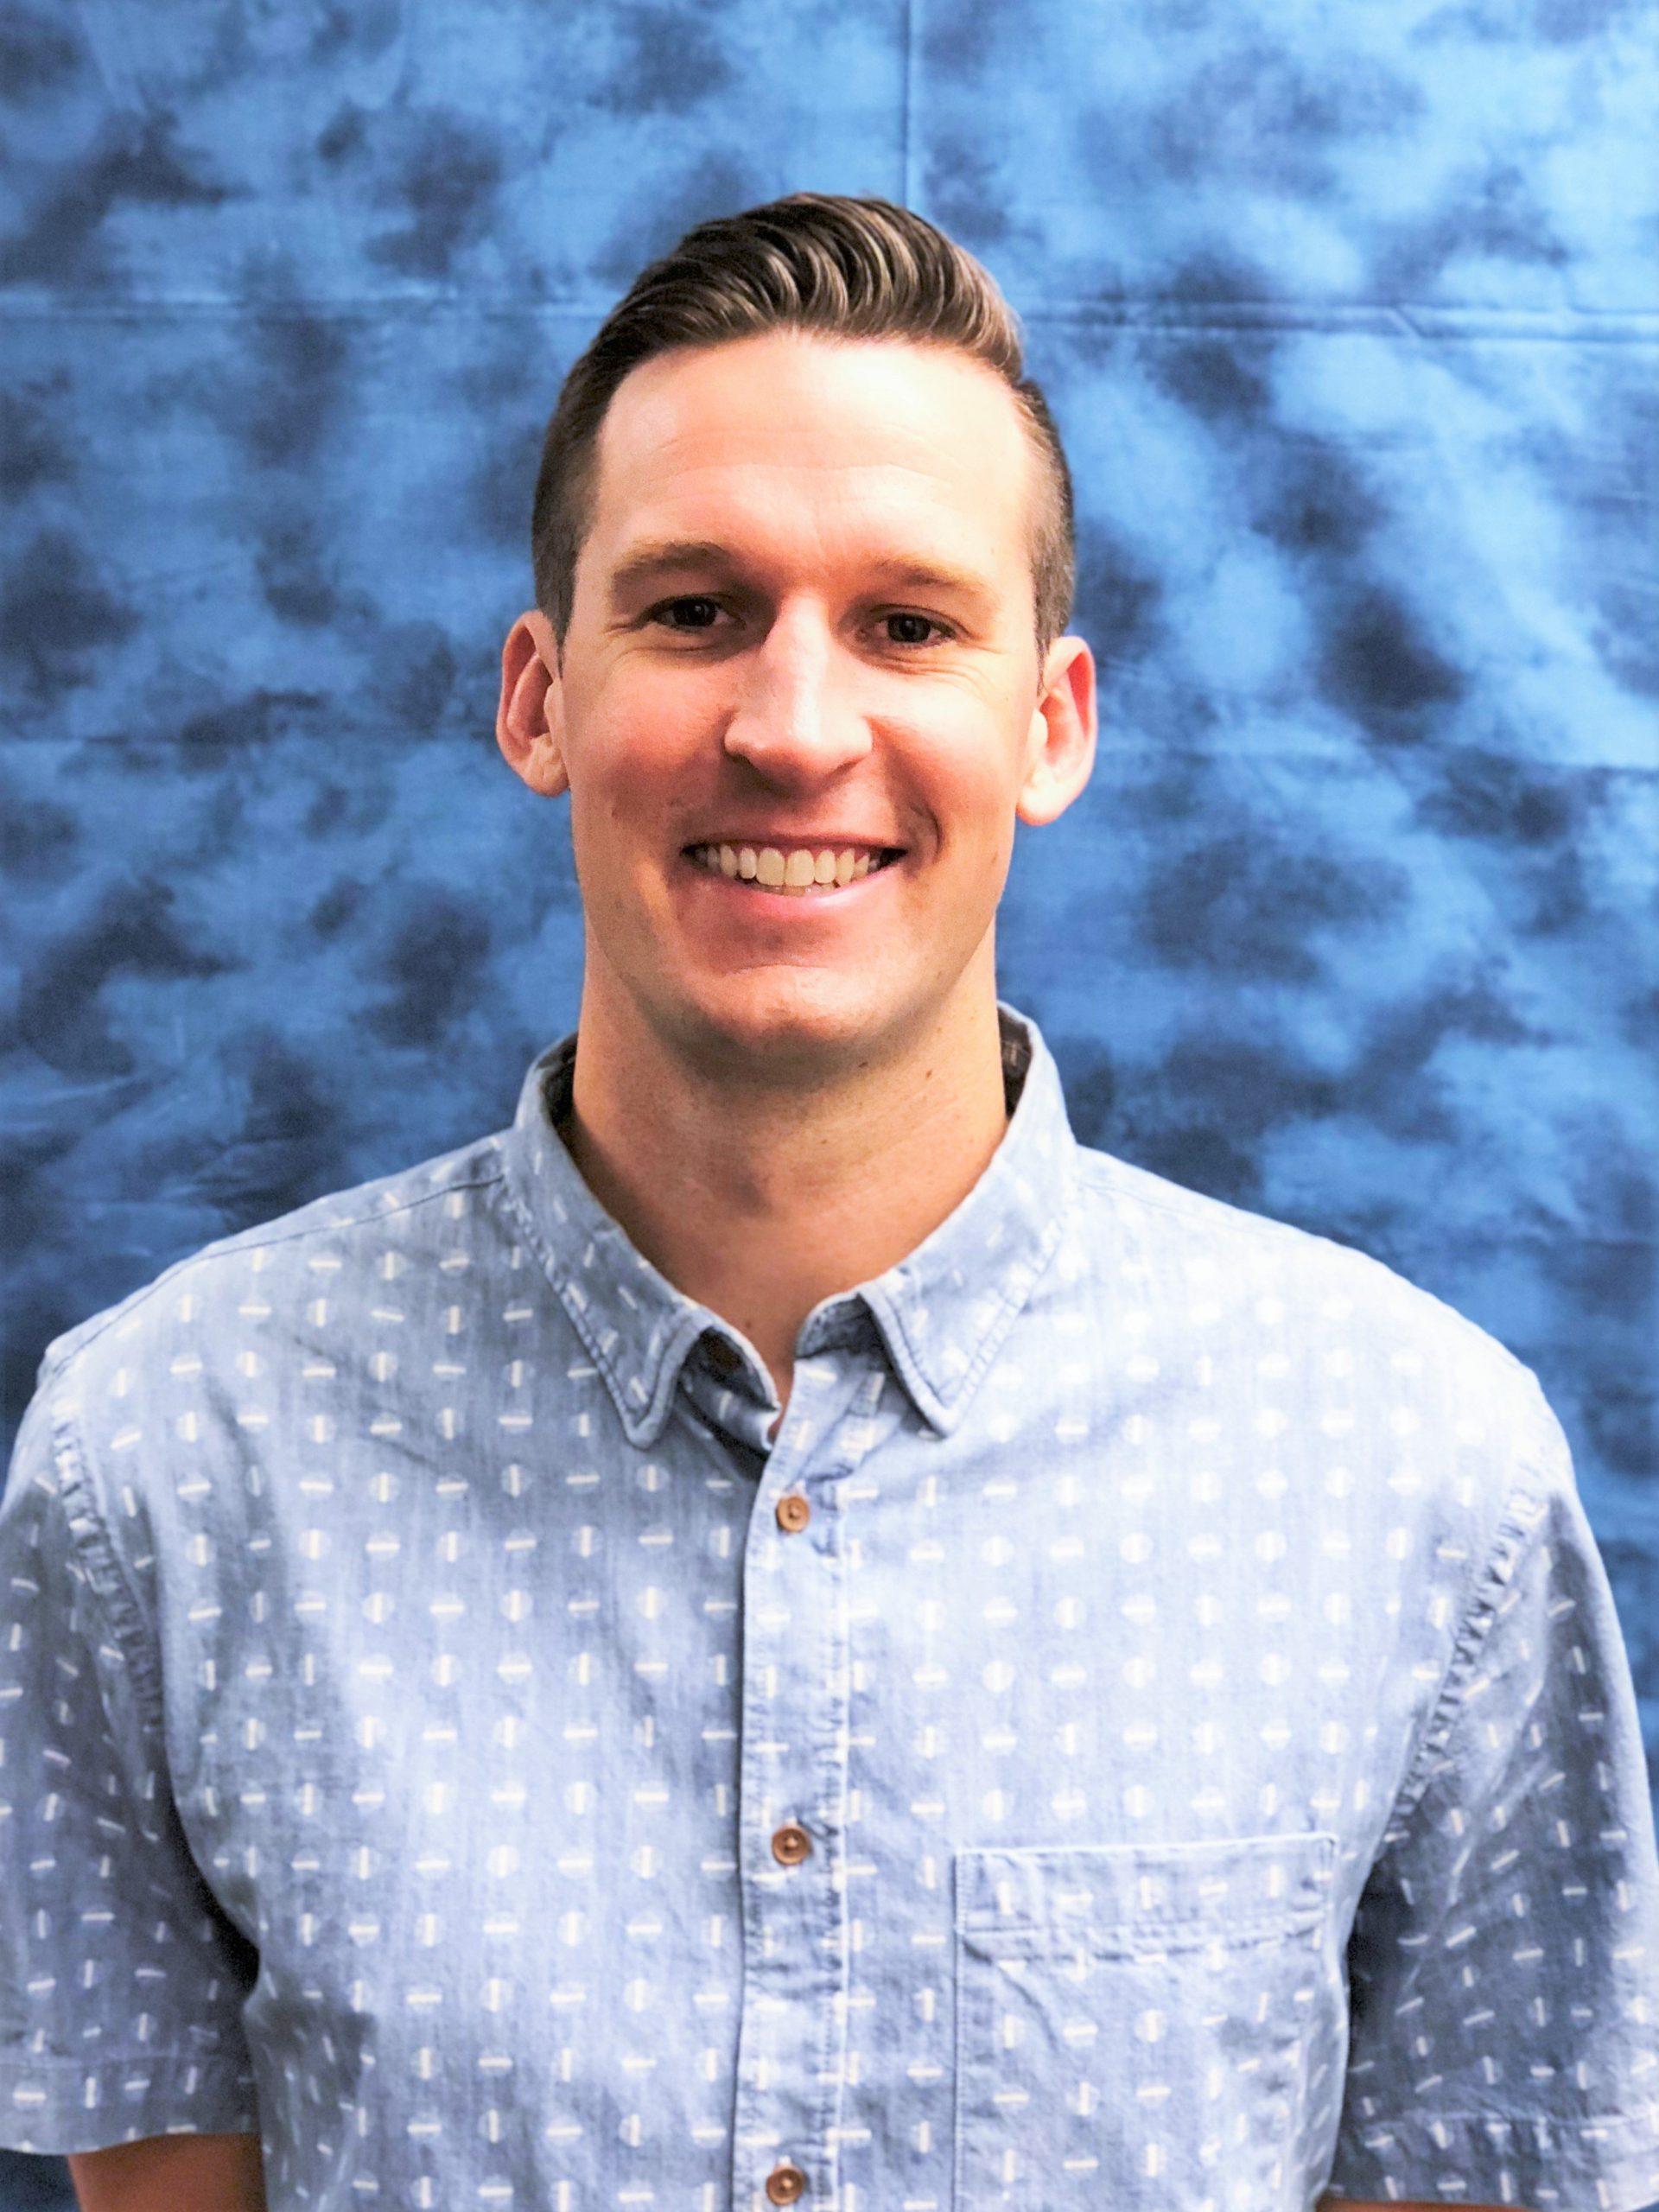 Meet Our Staff Mondays: Mr. David Gantt